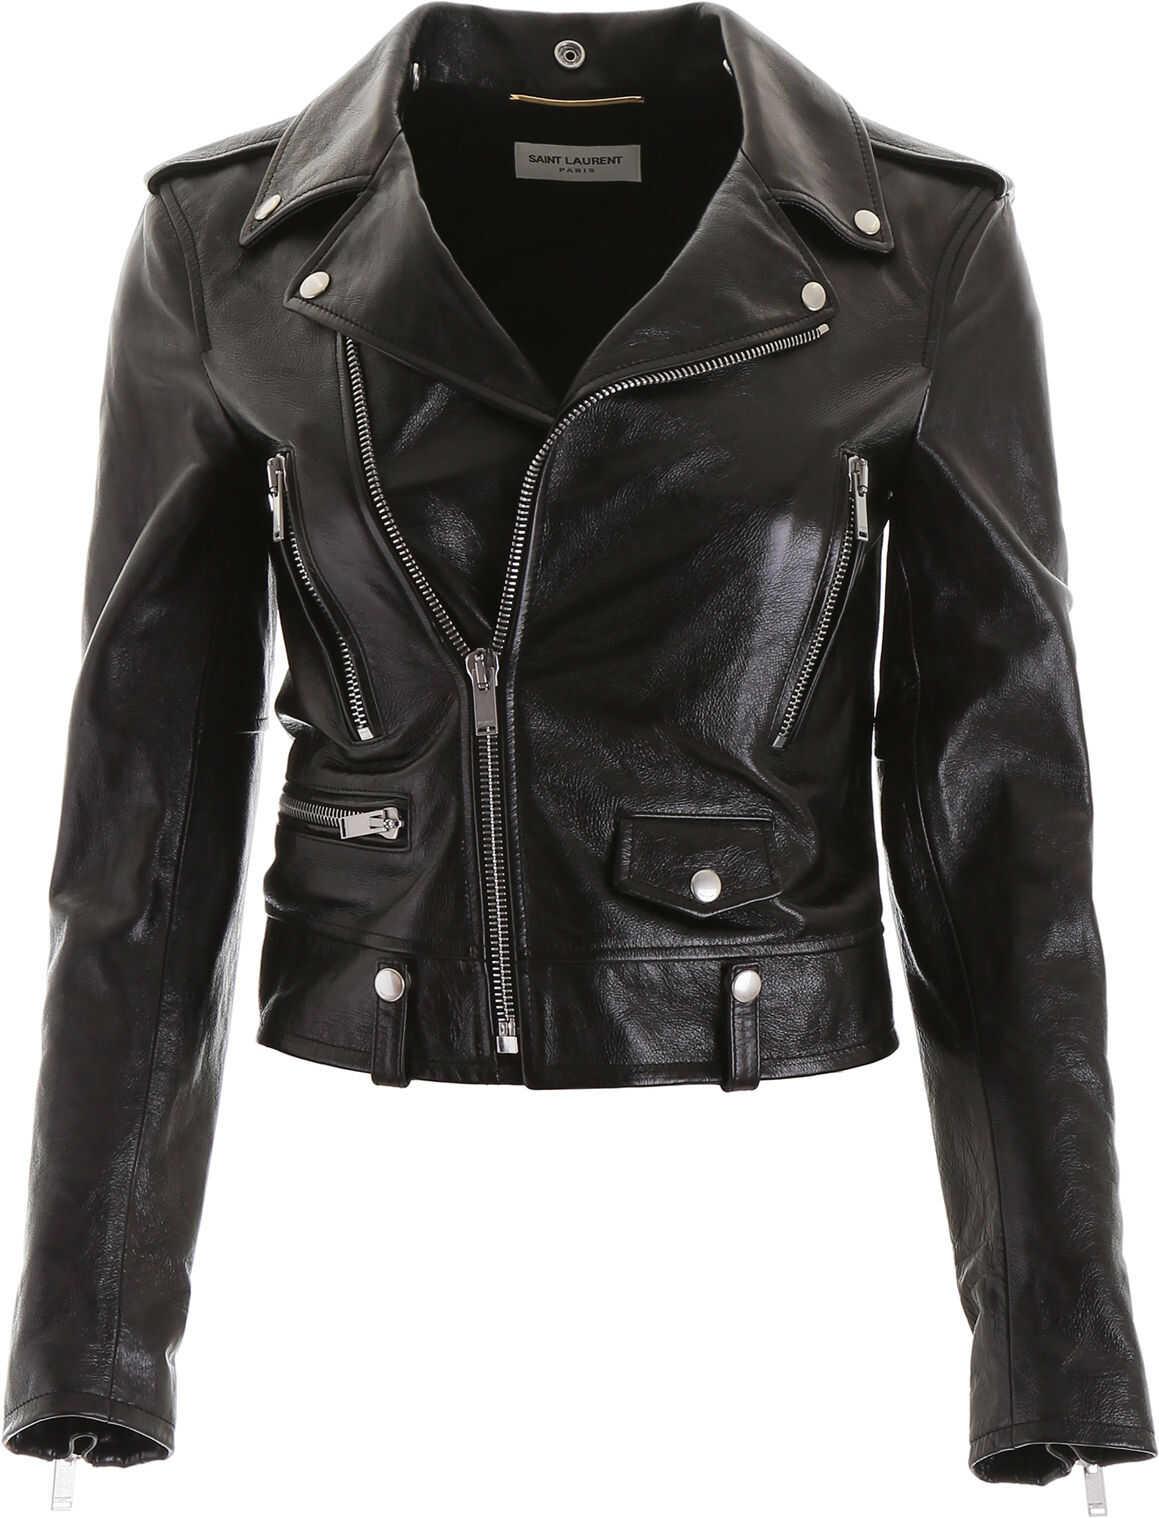 Saint Laurent Biker Jacket BLACK